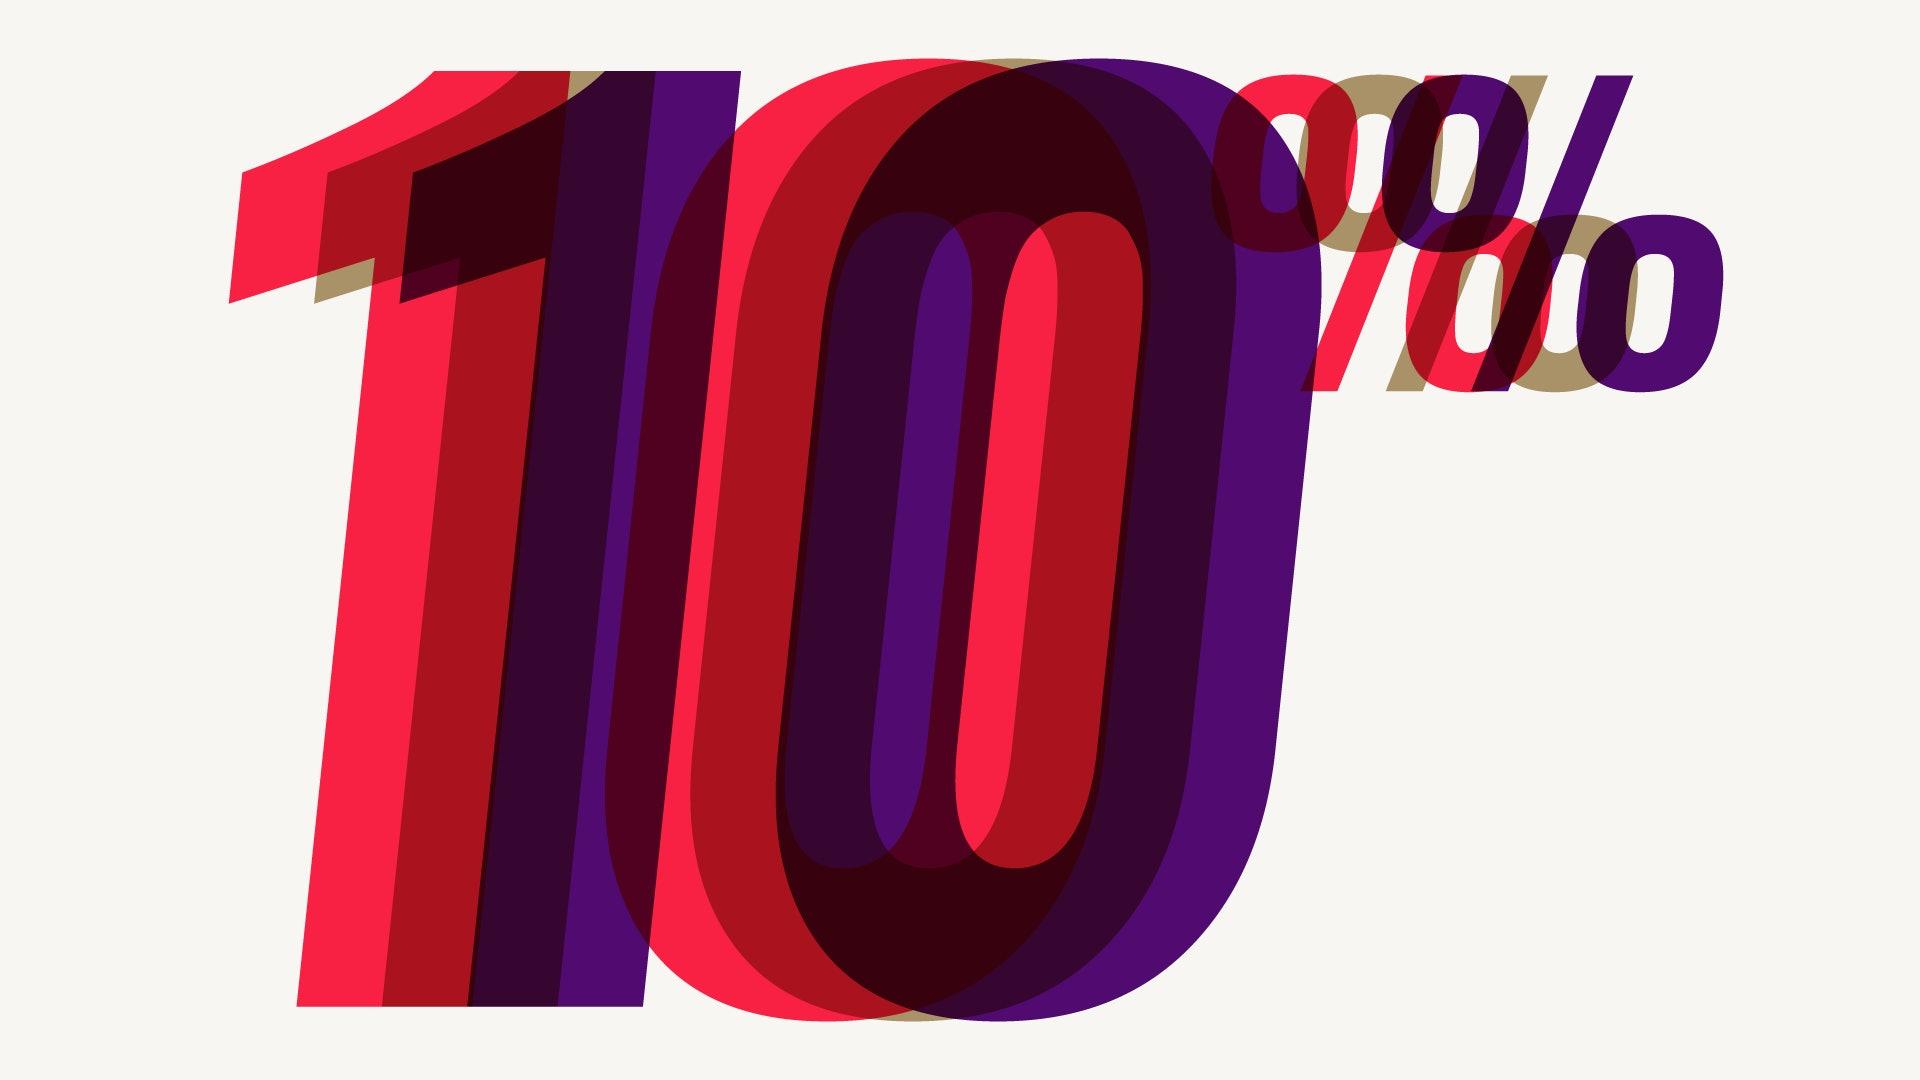 10% 10% 10% rules